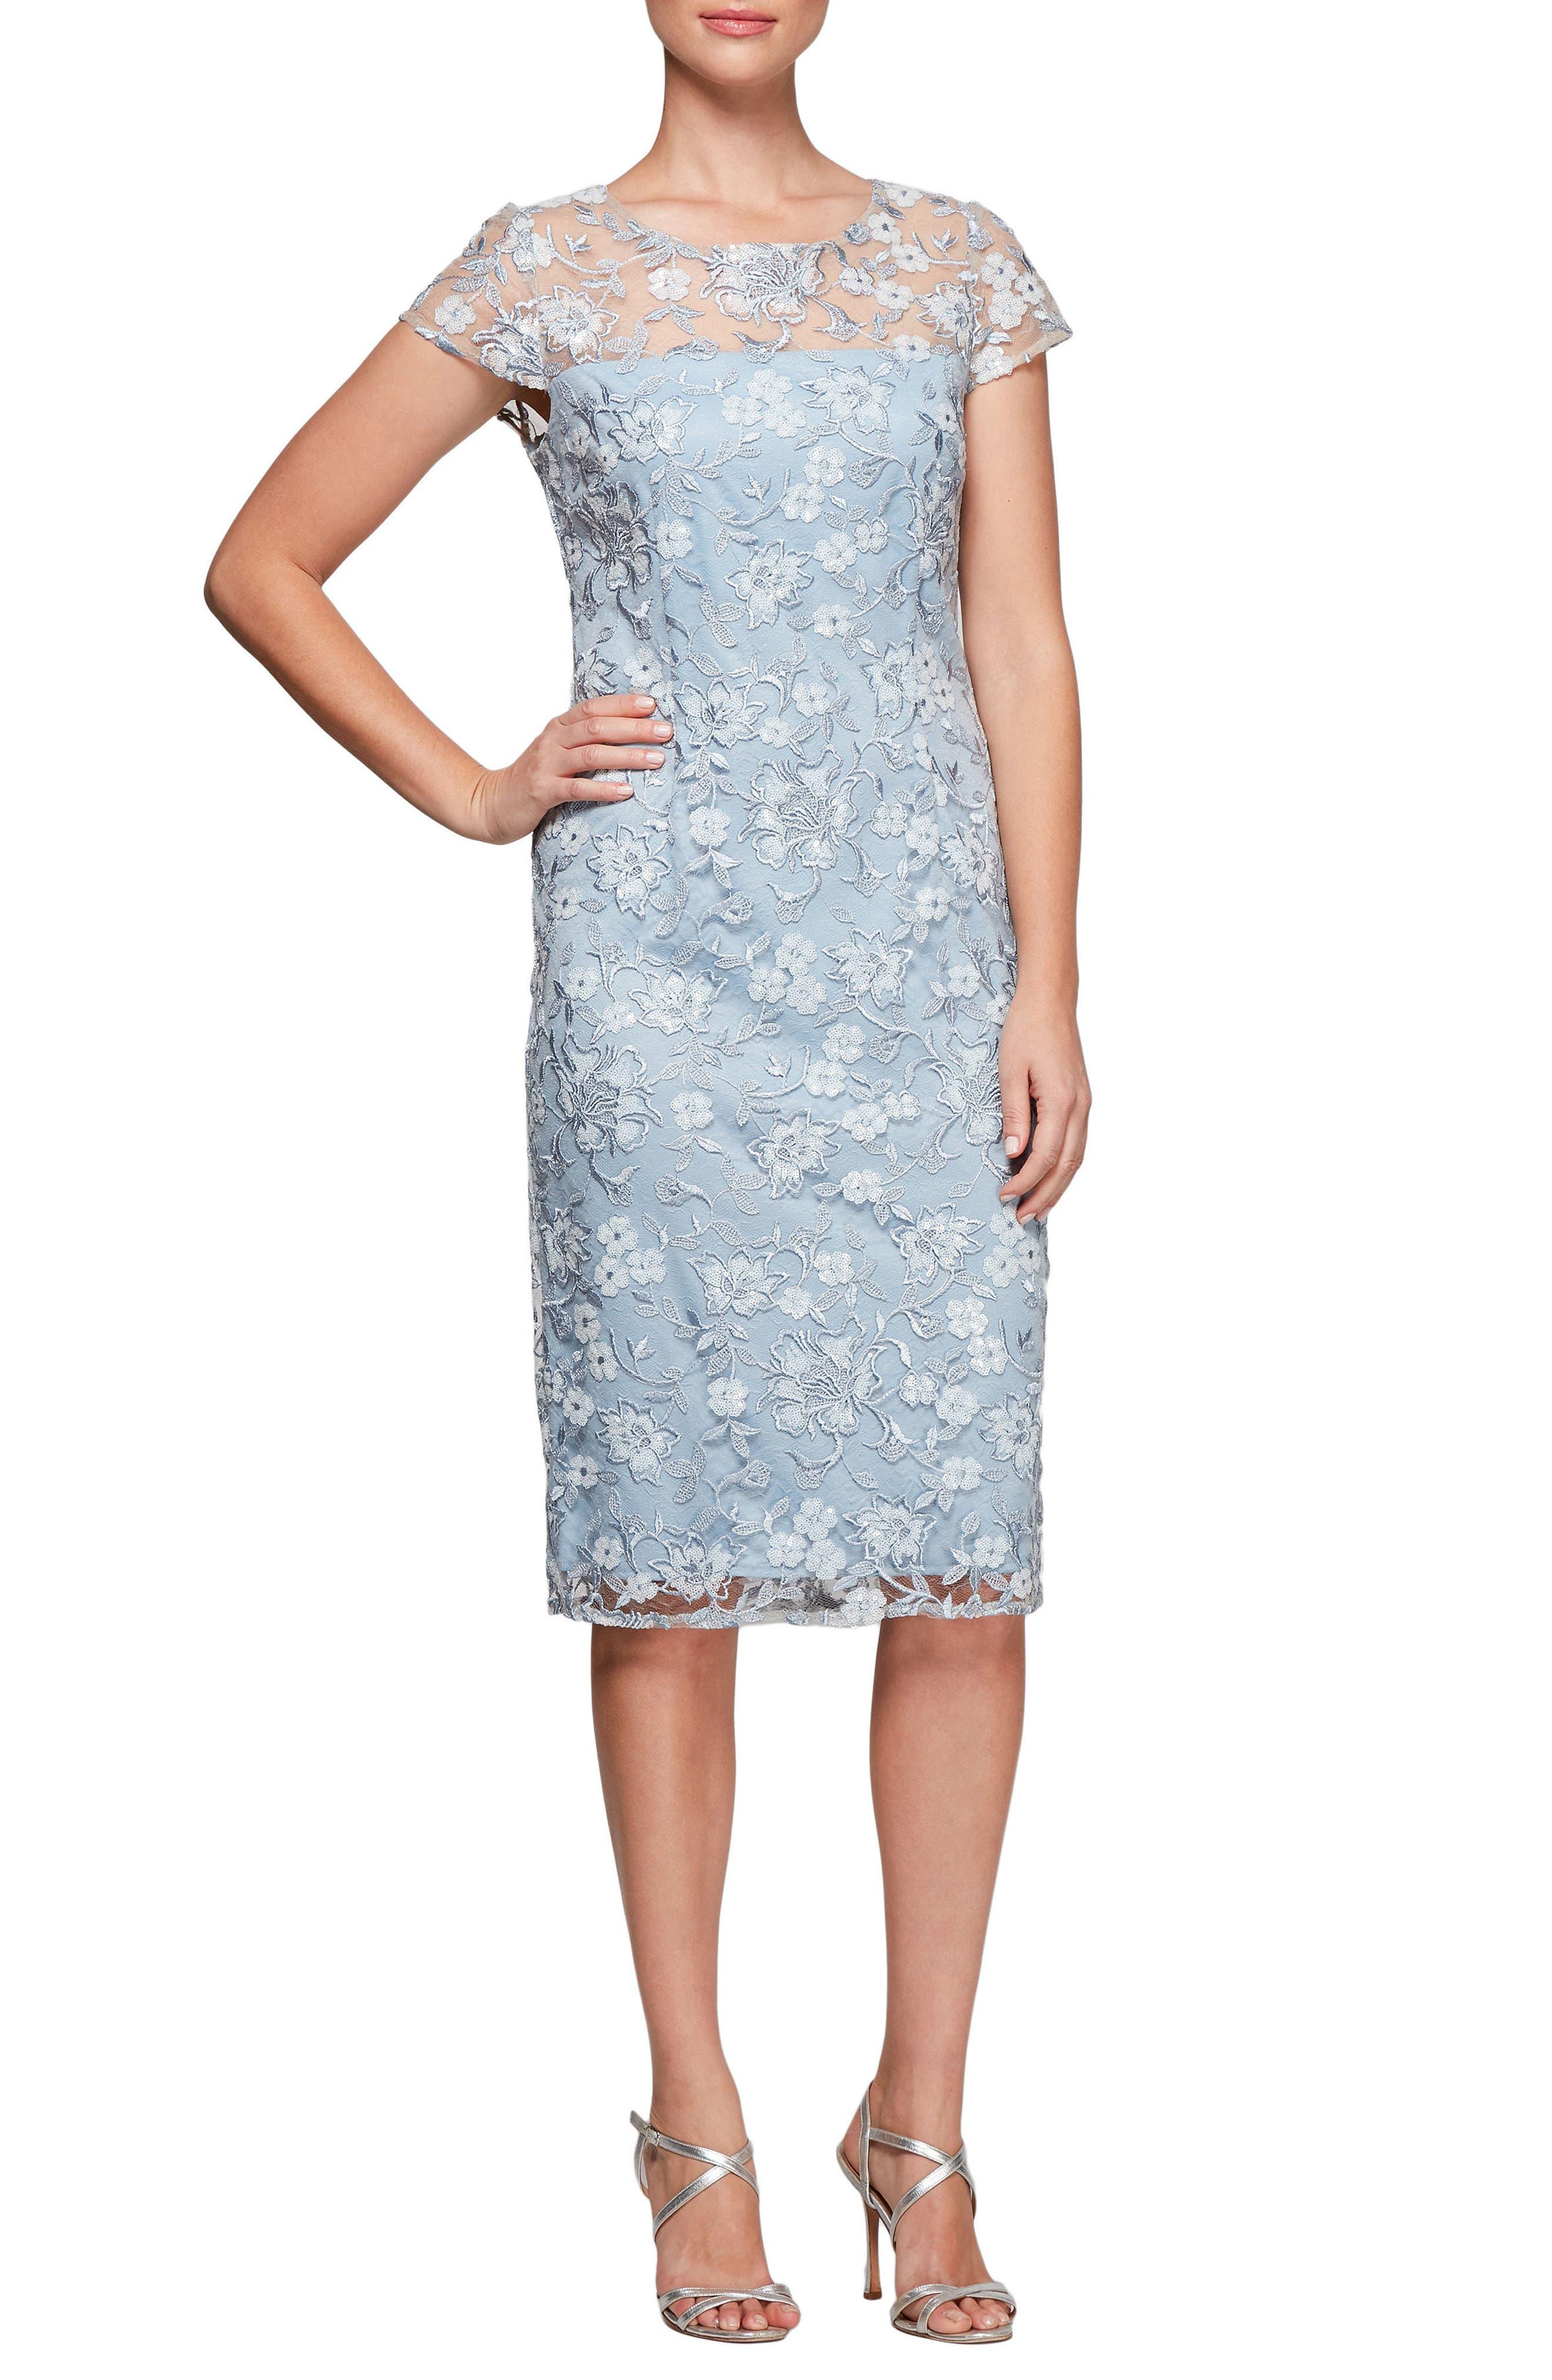 Floral Embroidered Shift Dress,                         Main,                         color, LIGHT BLUE